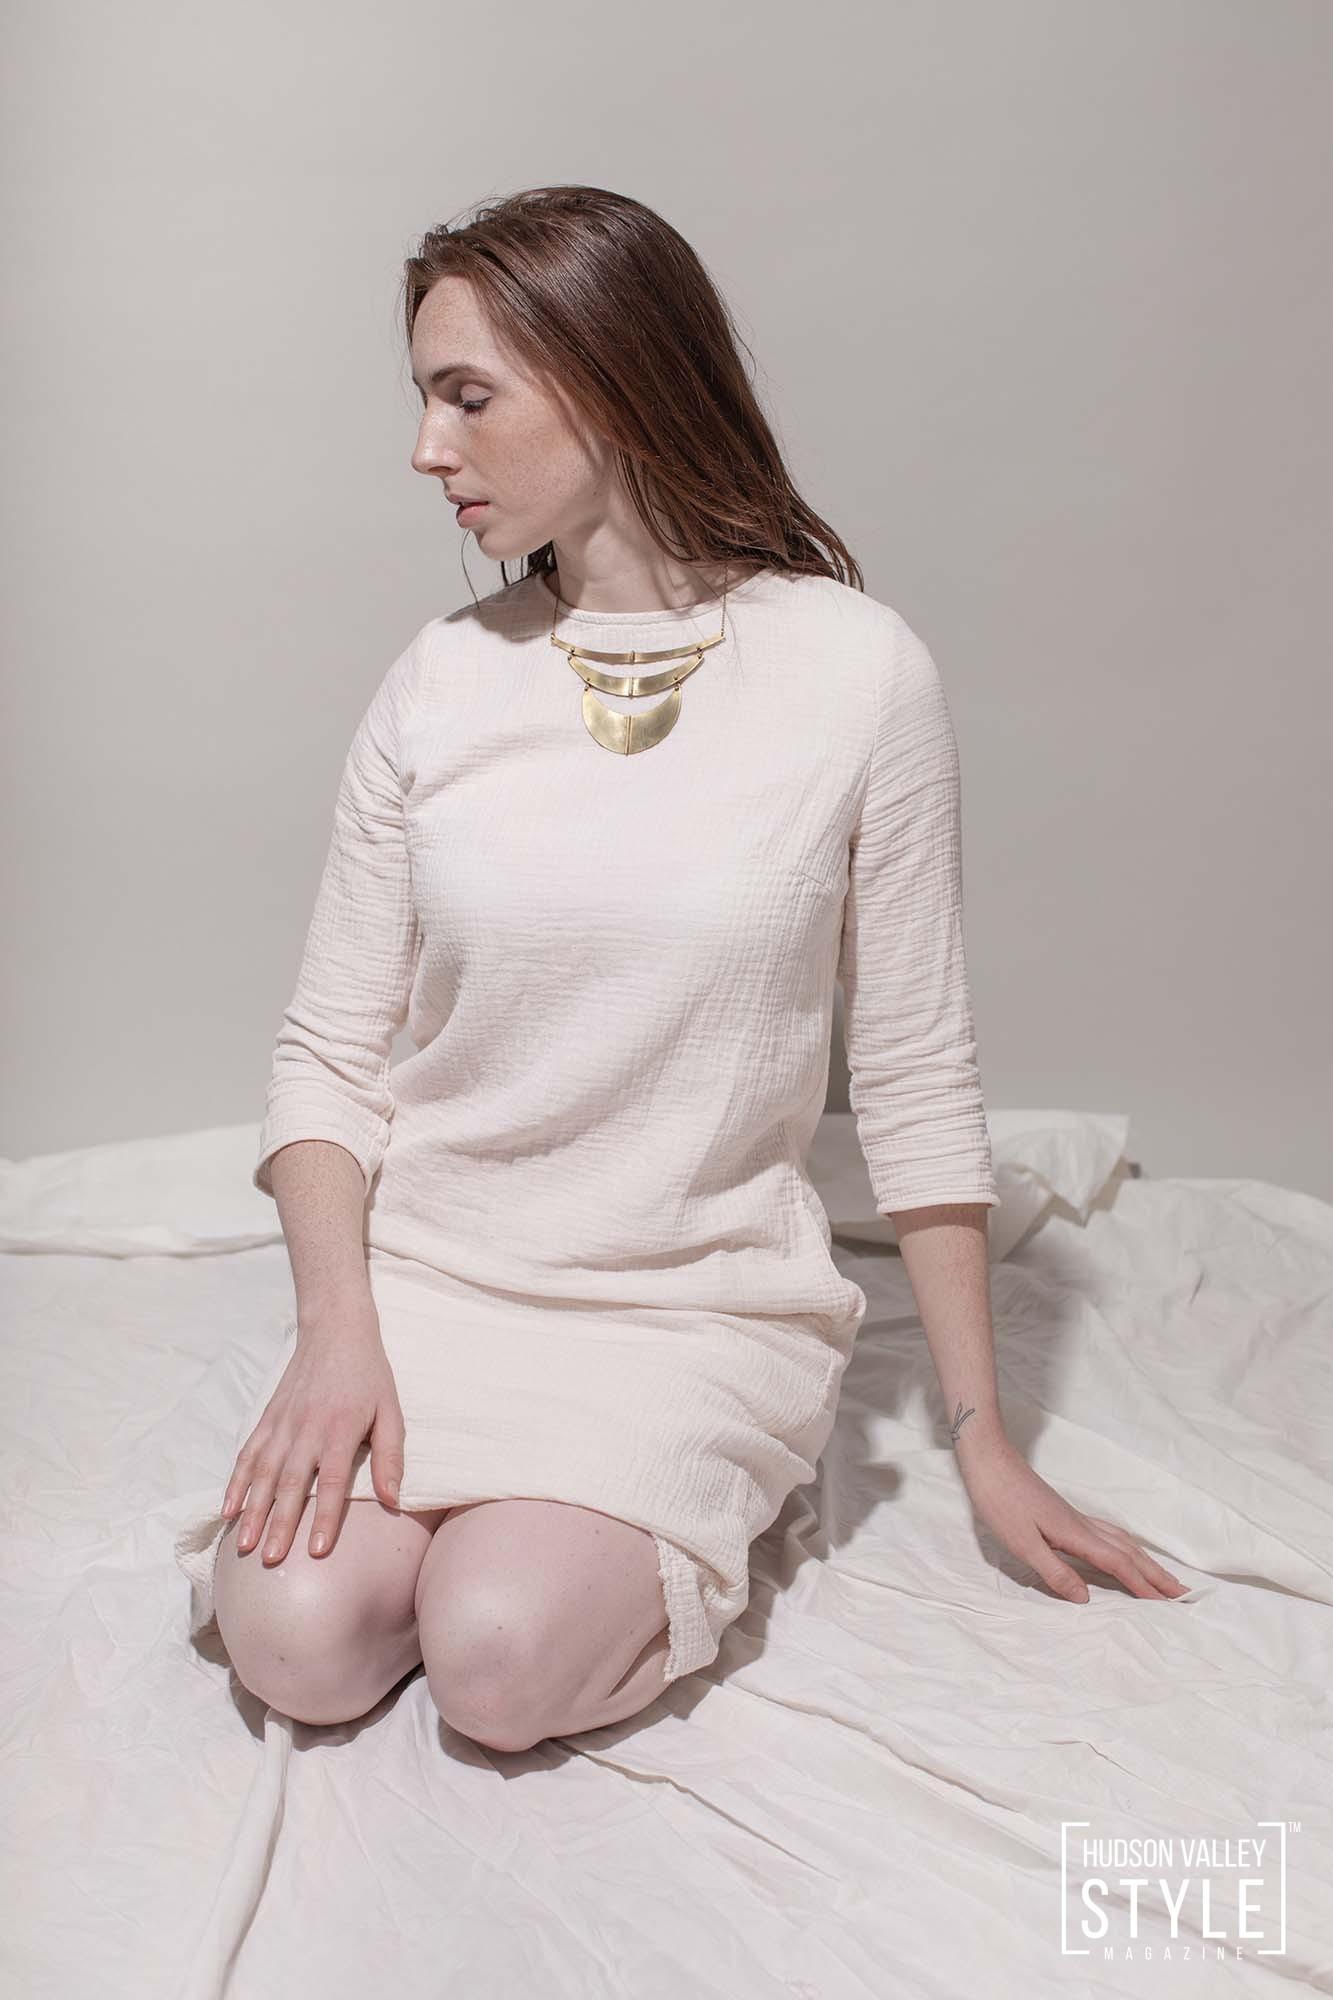 Aligned Necklace - Tiny Anvil